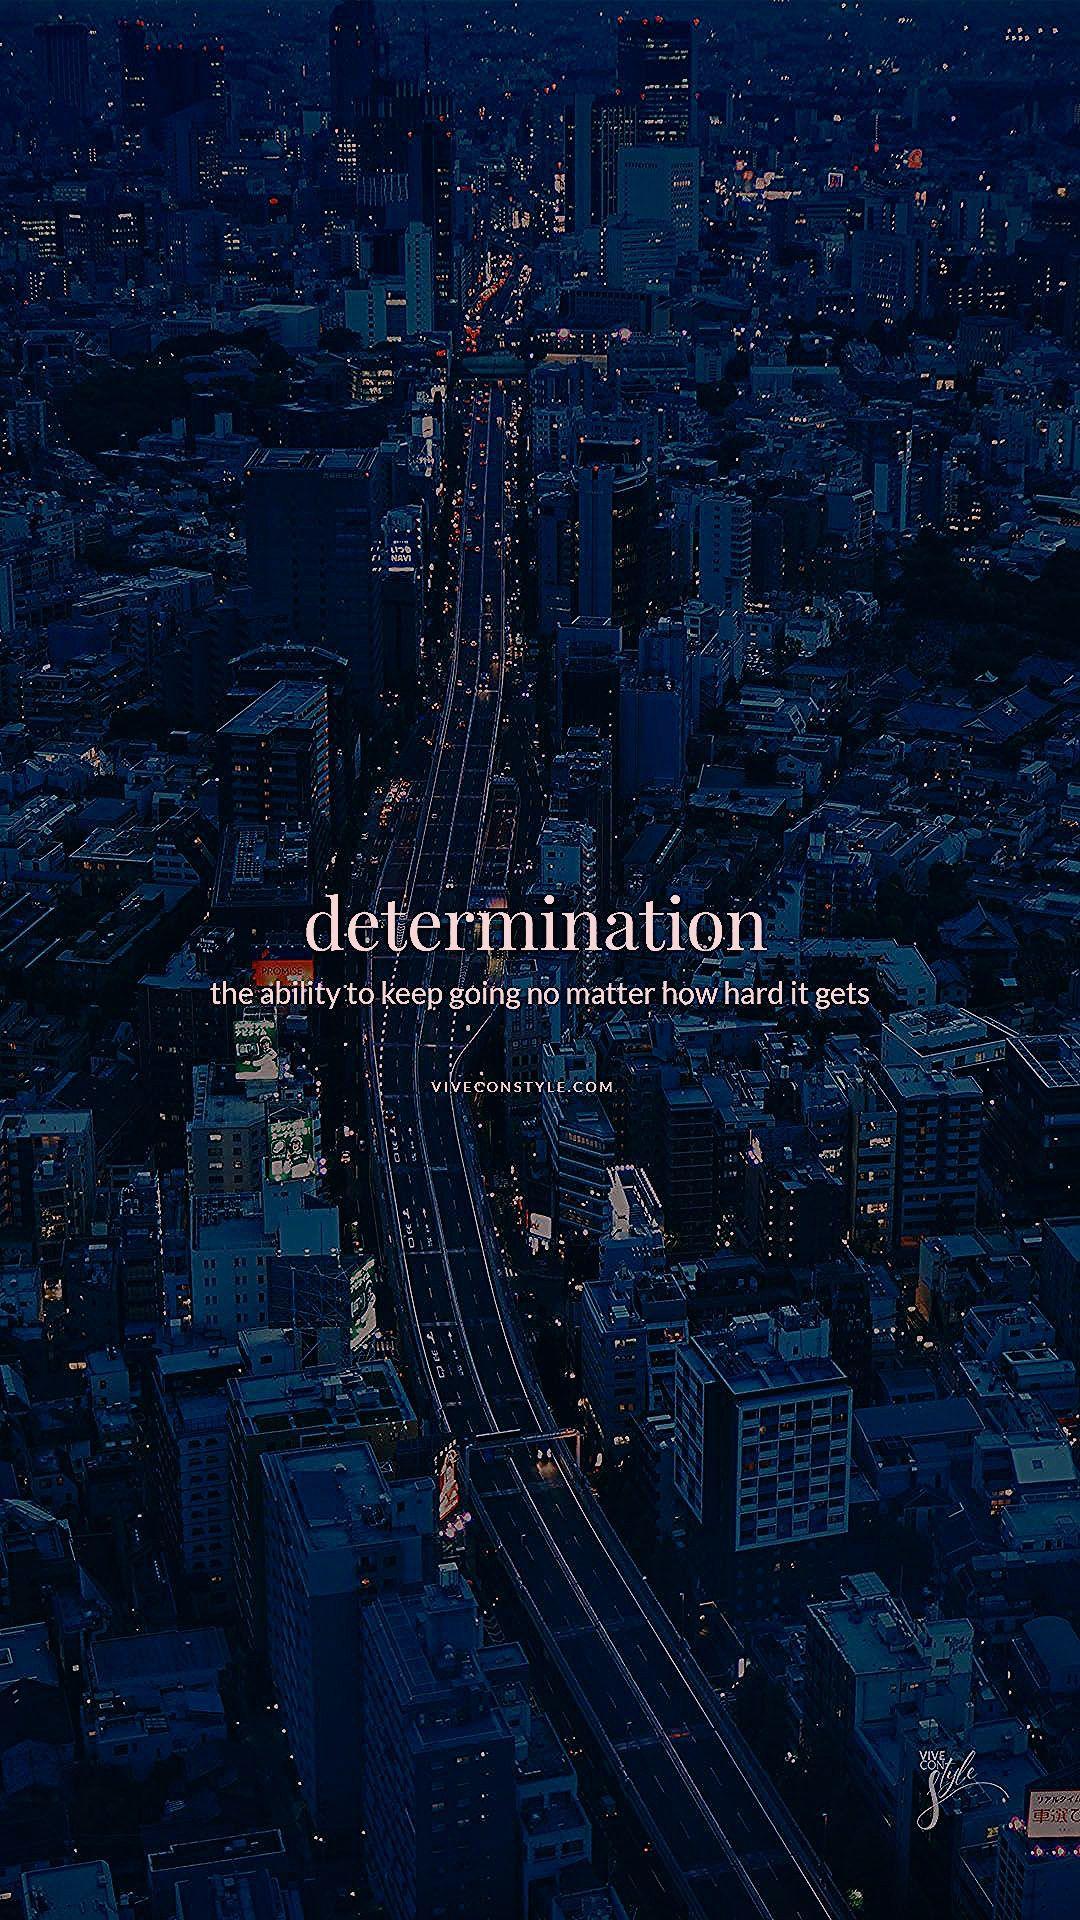 Photo of Determination quote mobile wallpaper | VIVE CON STYLE